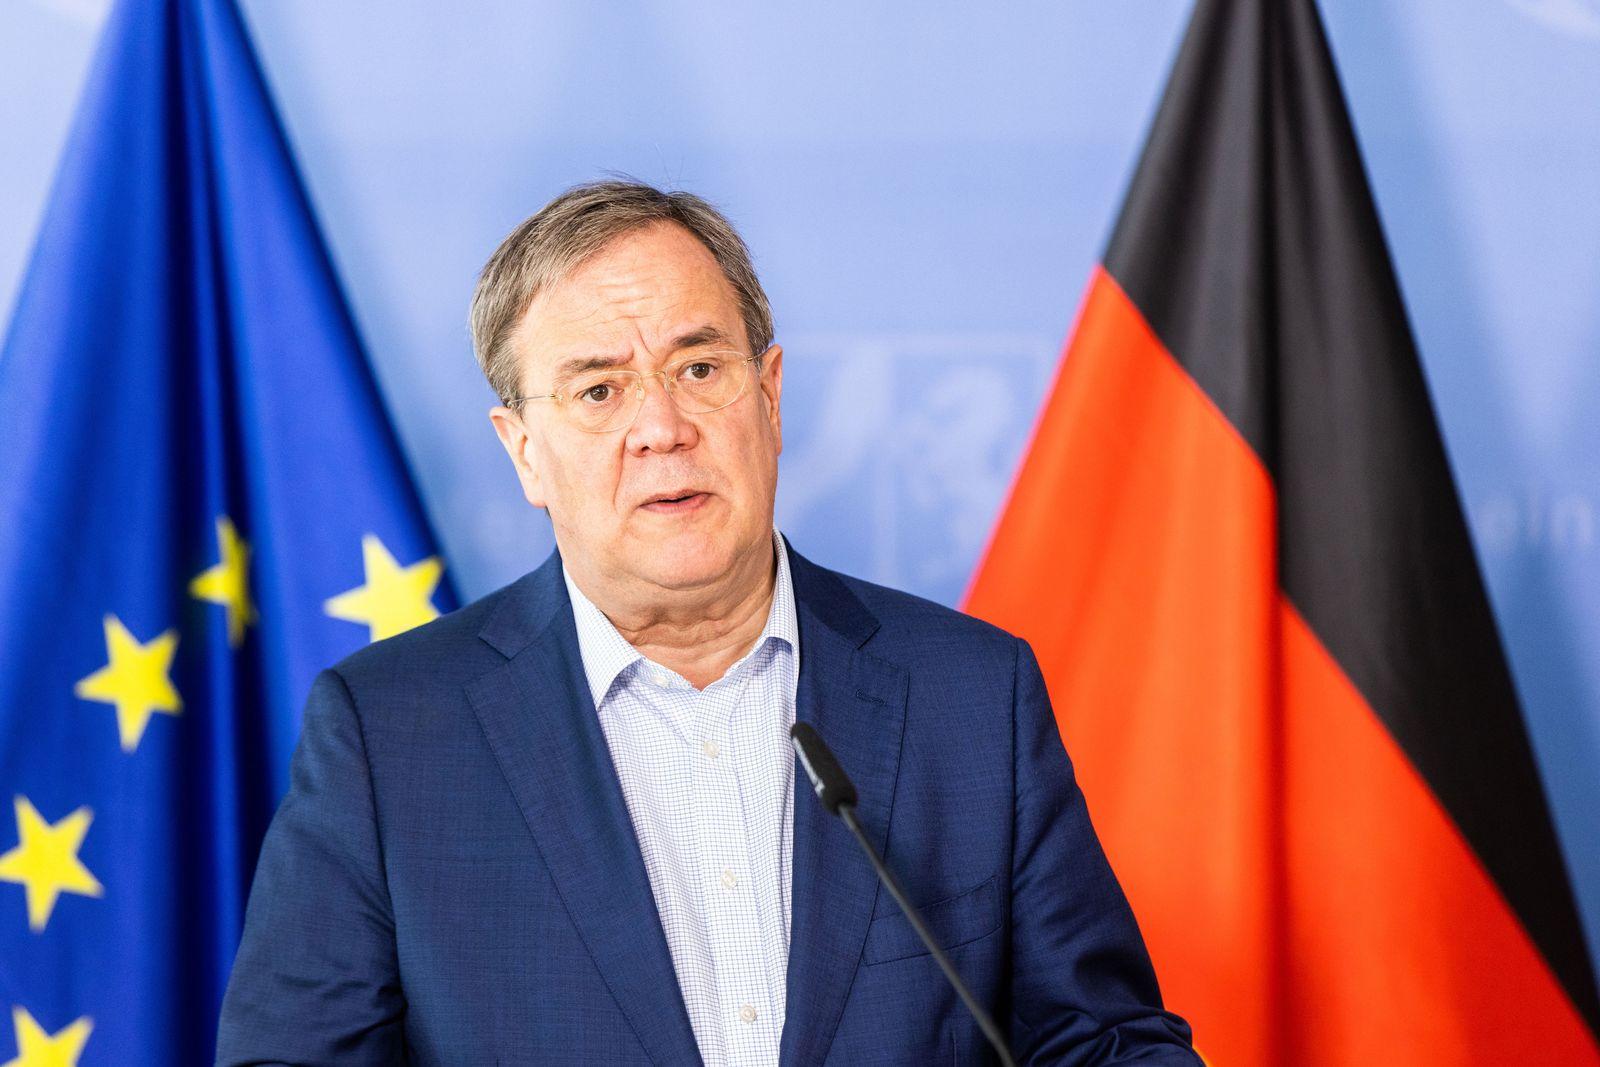 Landesregierung Nordrhein-Westfalen - Unwetterkatastrophe